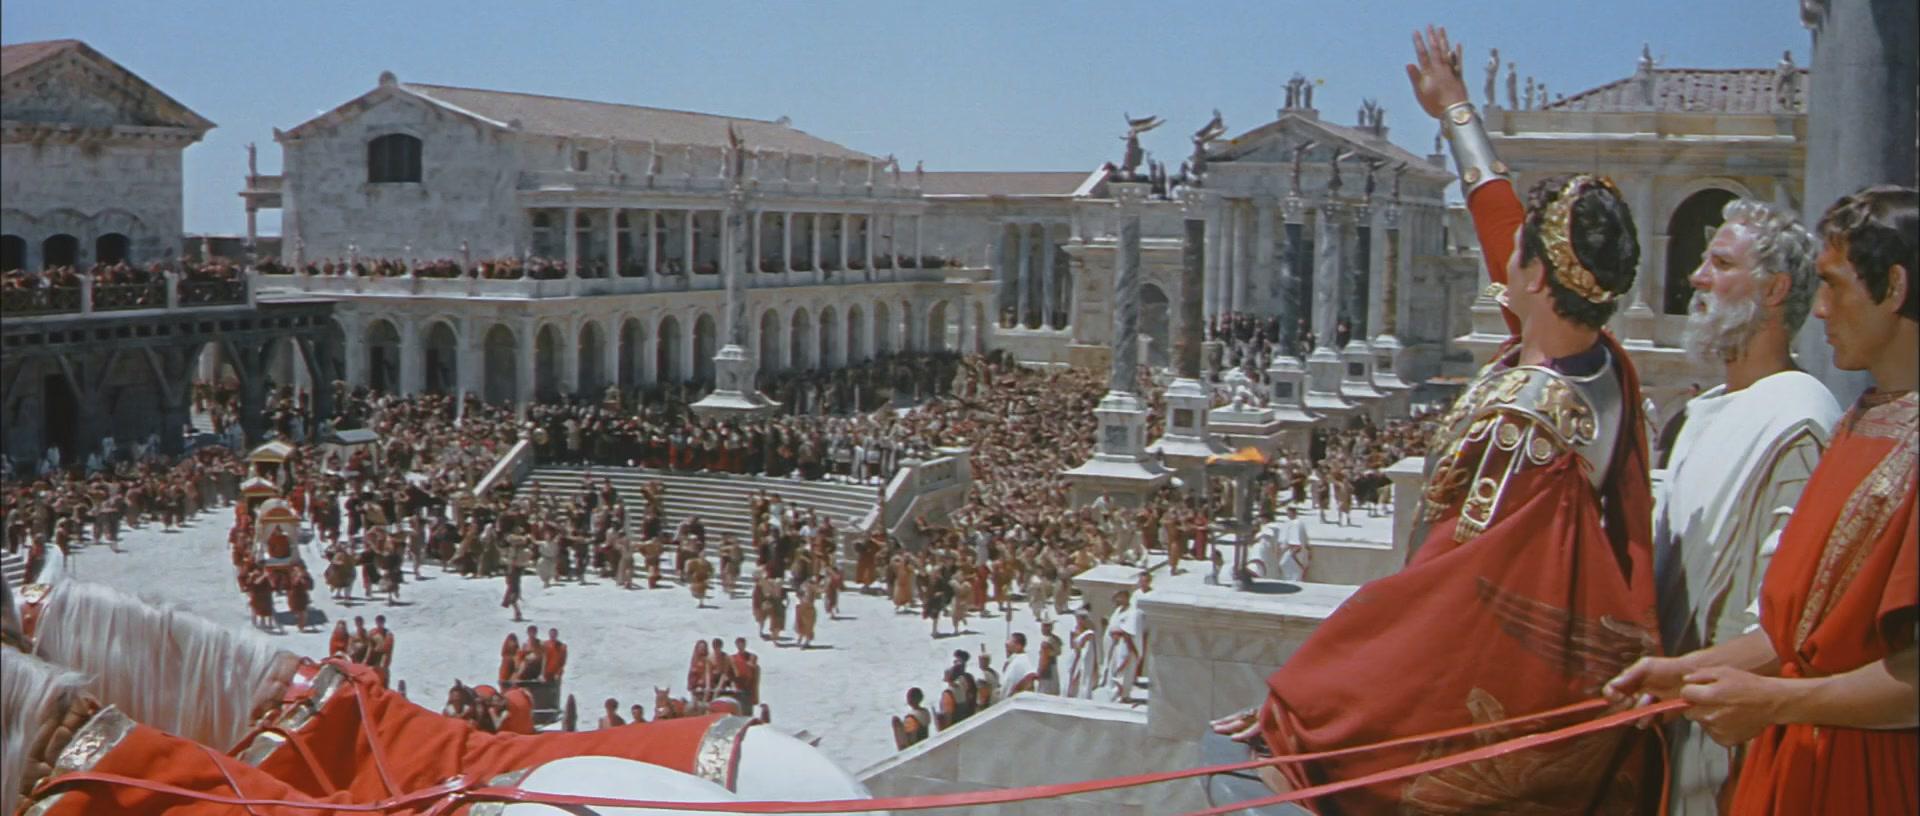 caída-imperio-romano.jpg